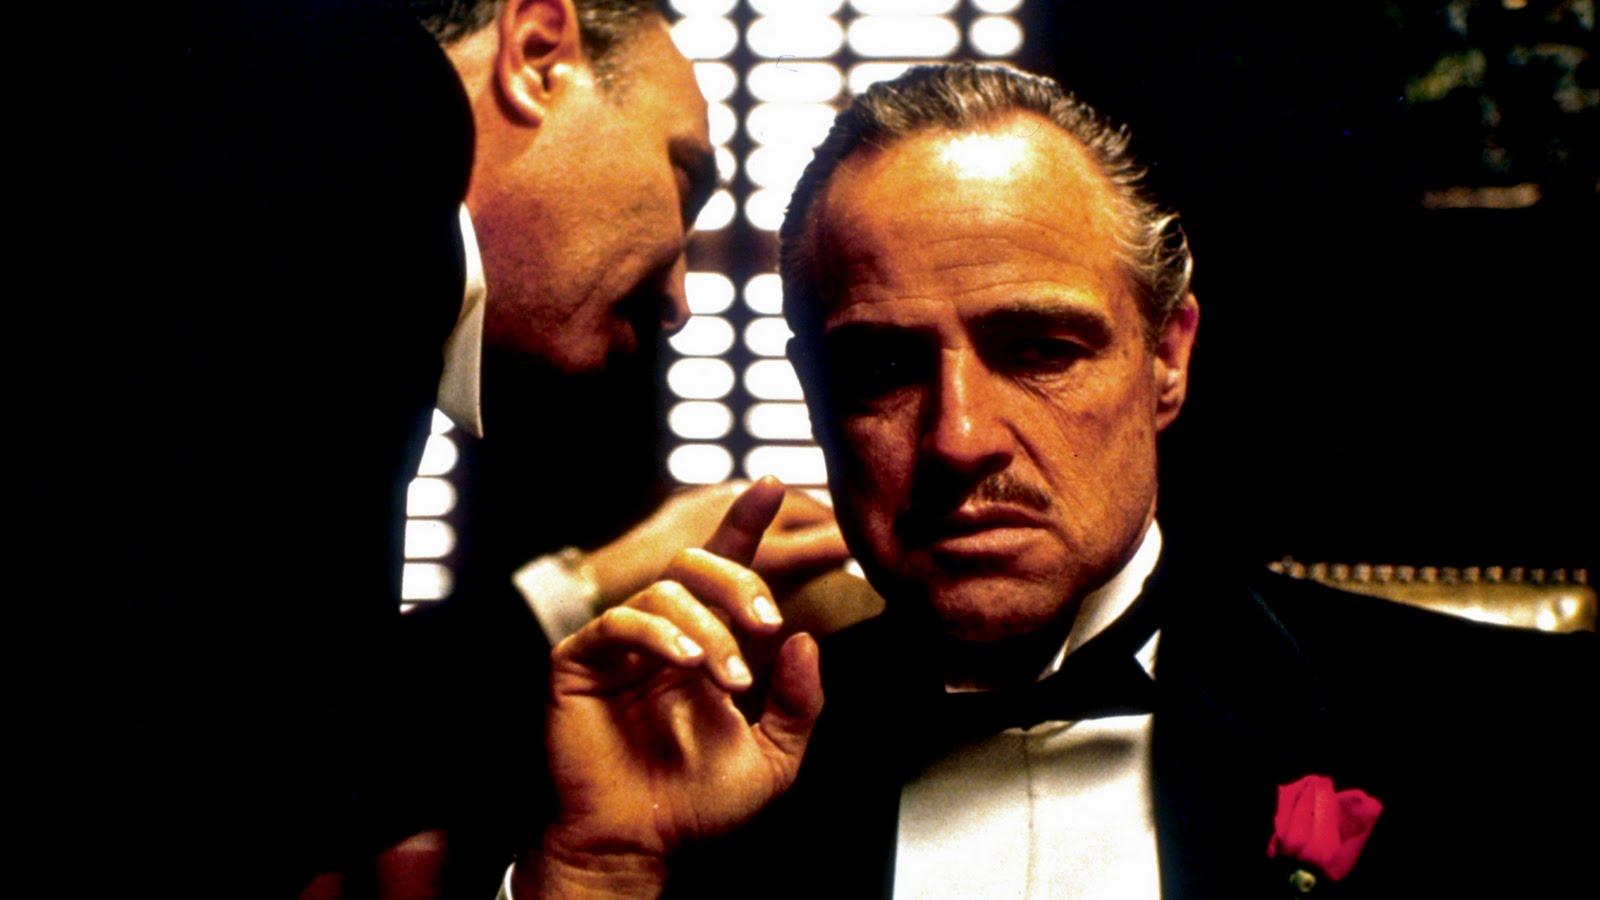 http://2.bp.blogspot.com/_0lkHFmksBHE/TGPl8vQWCHI/AAAAAAAACrY/EVtEfaGRWtU/s1600/brando-godfather.jpg.jpeg